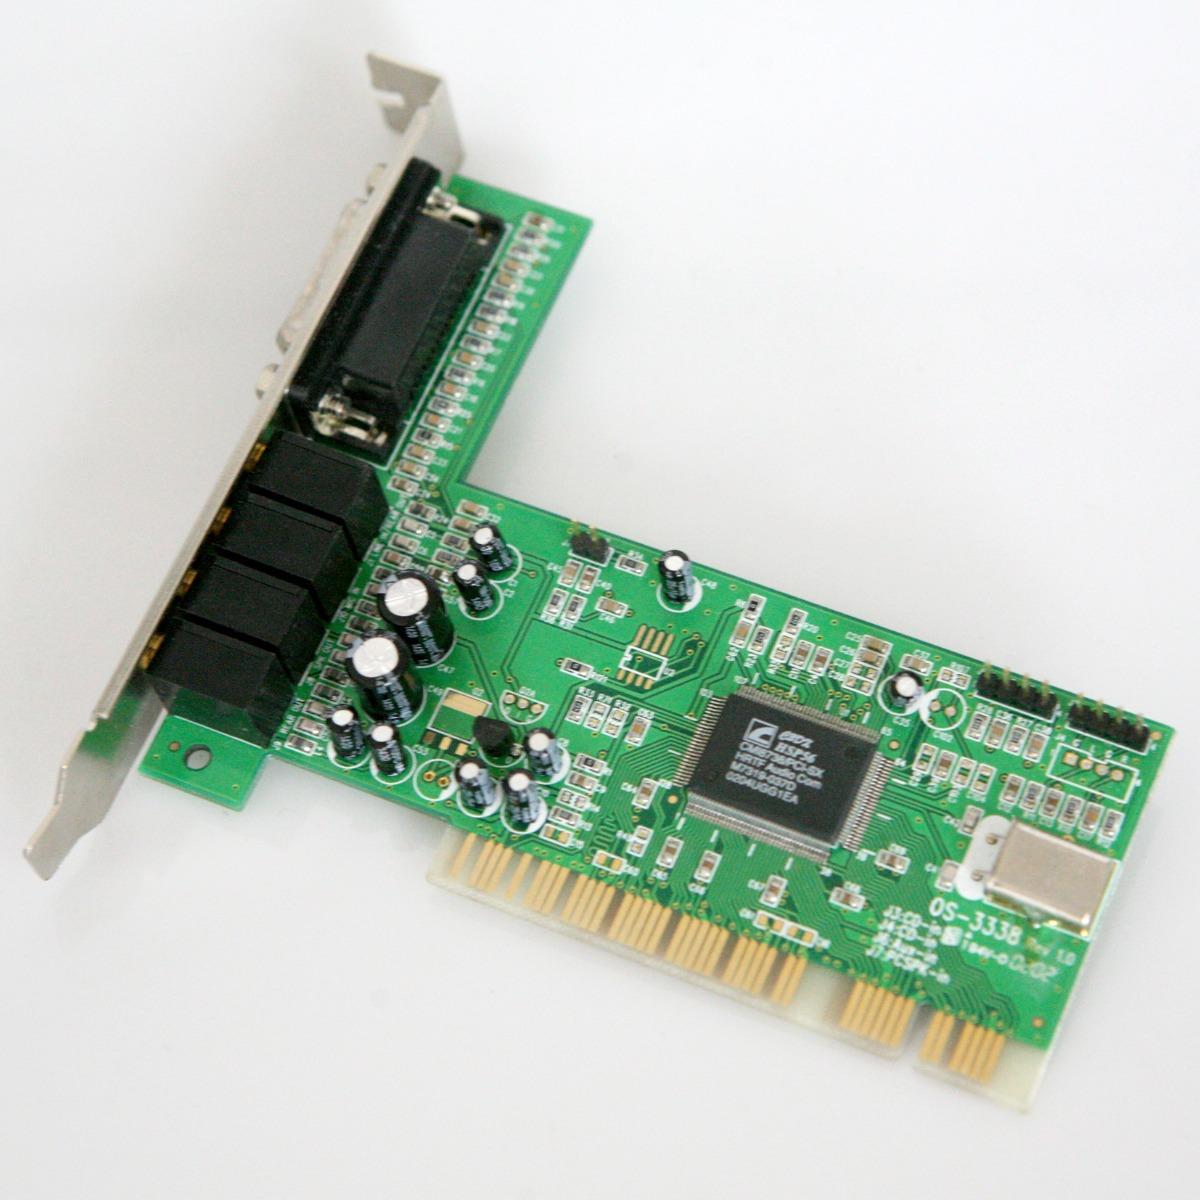 DRIVERS FOR HSP56 CMI8738 PCI SX AUDIO